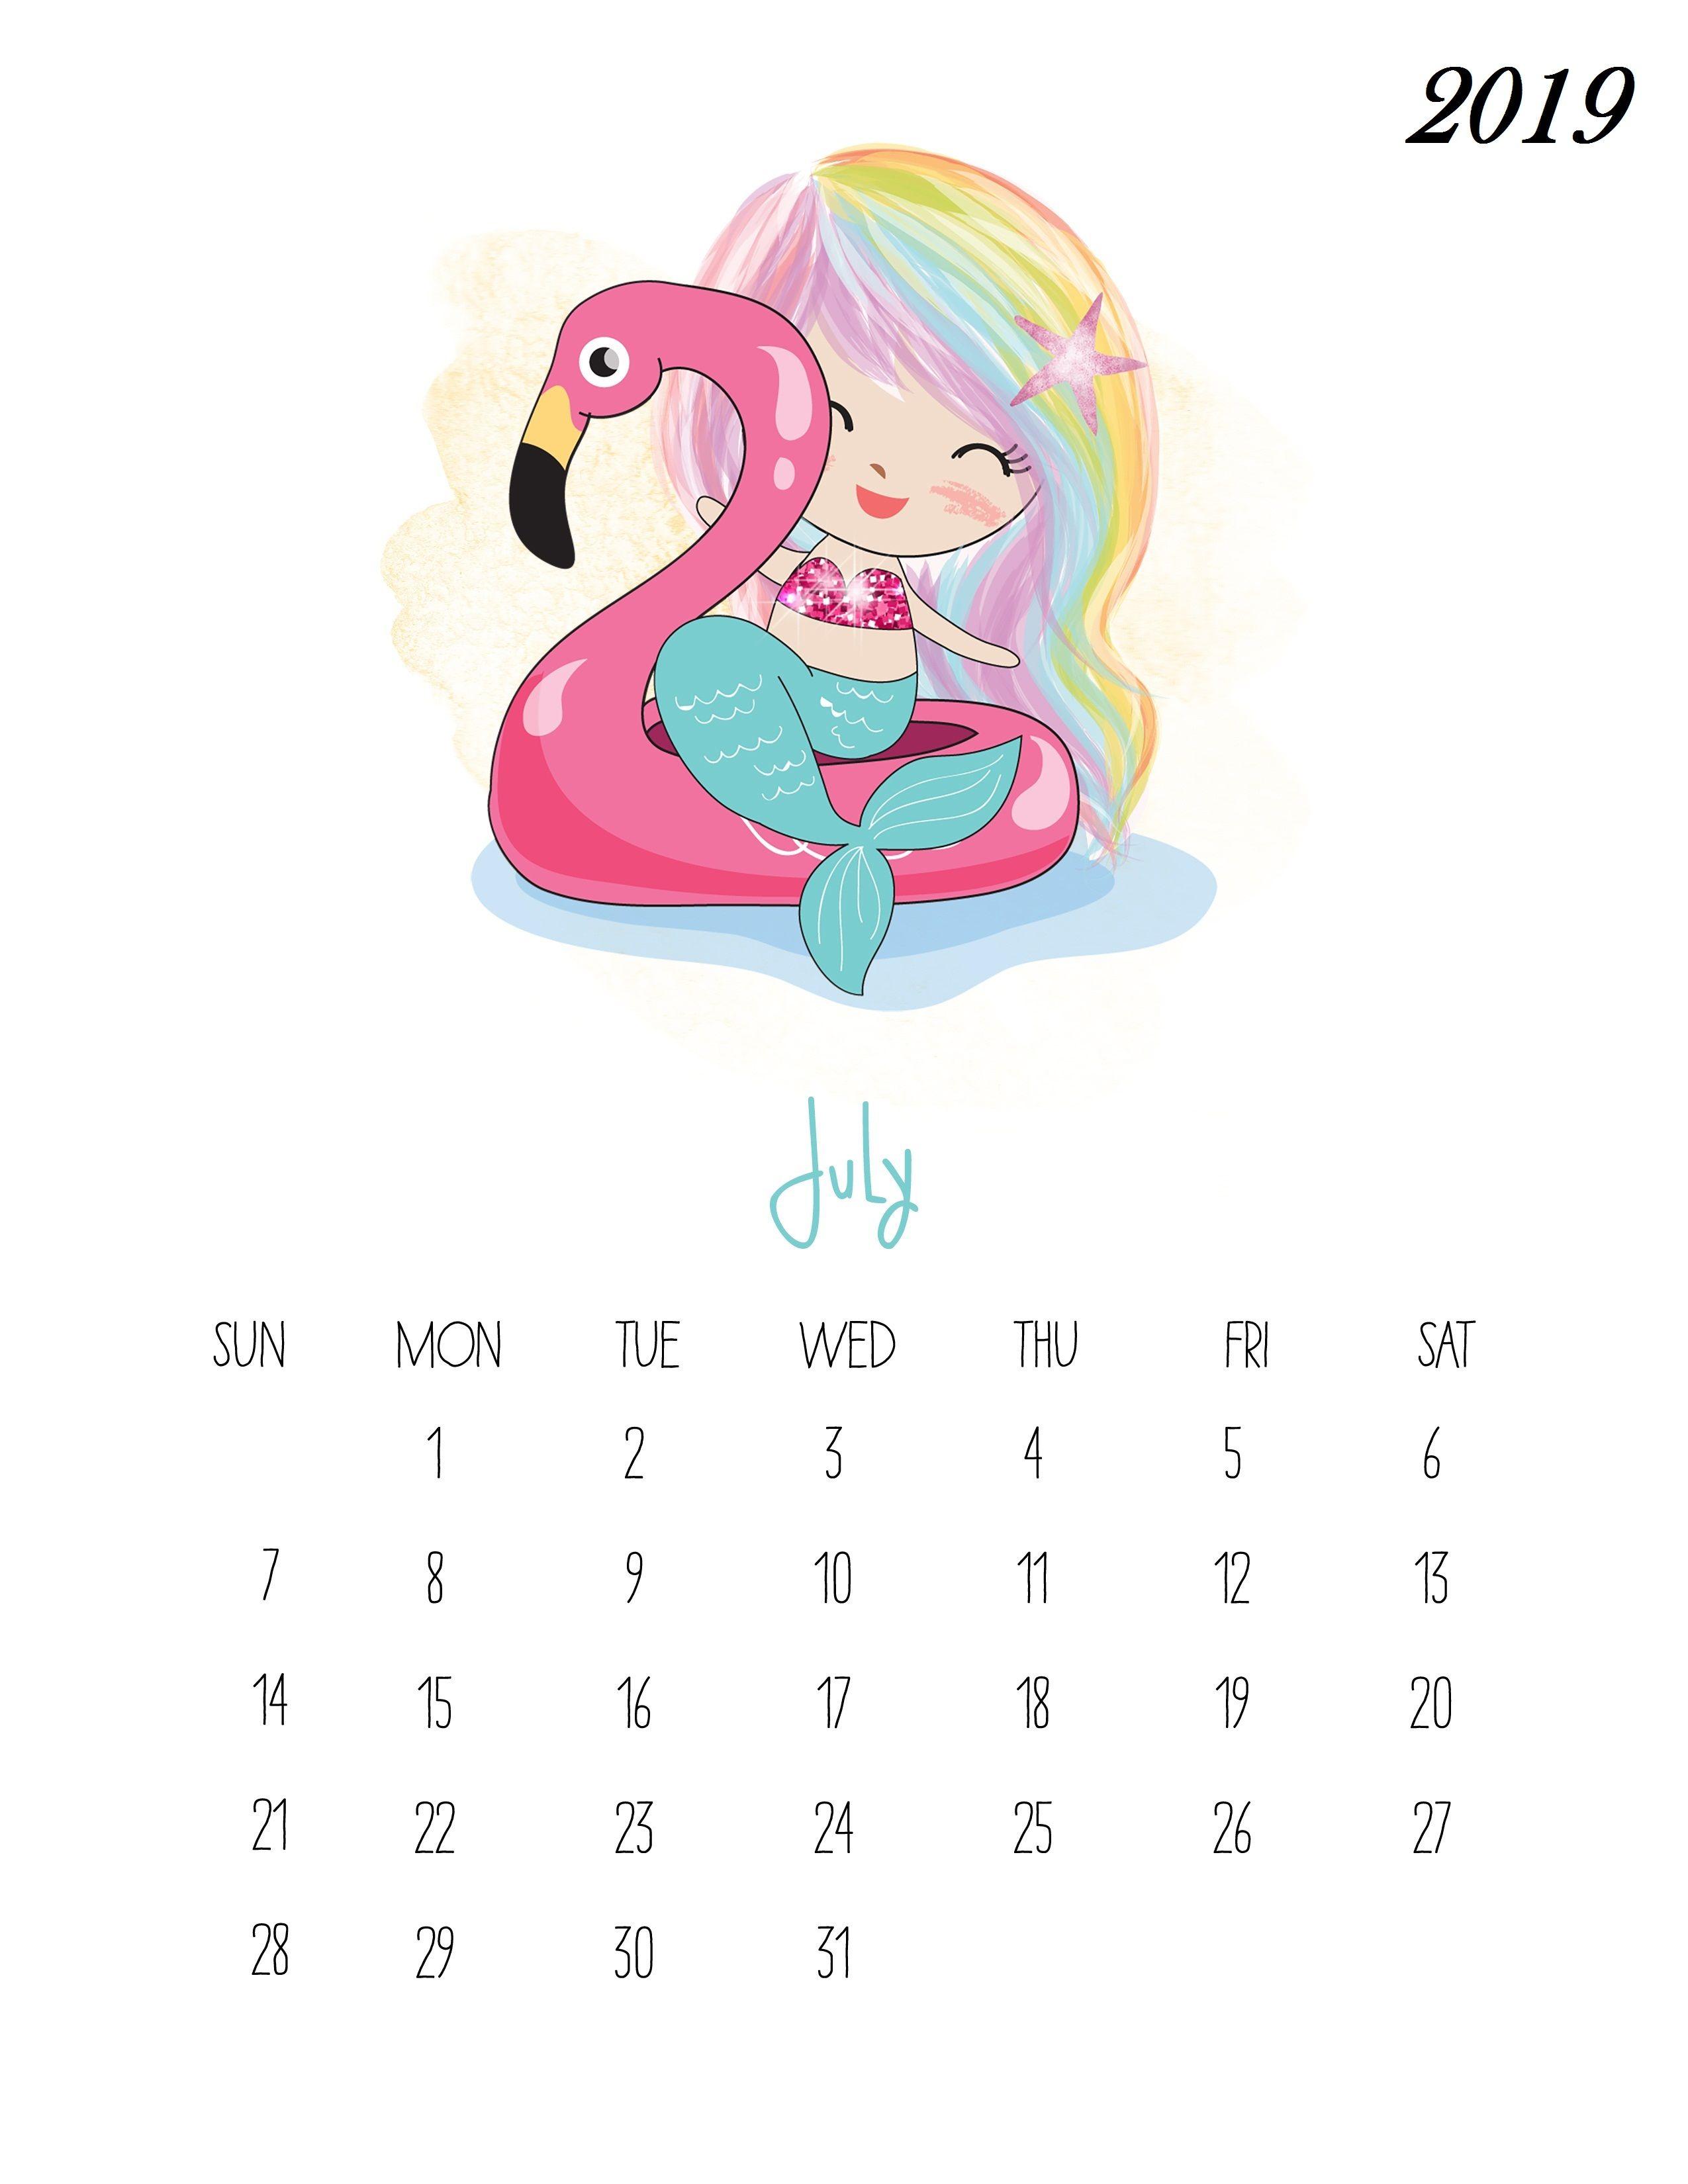 Printable Calendar 2019 Pocahontas Prinsess For February For Kids Free Printable July 2019 Kids Calendar | Calendar | Kids calendar